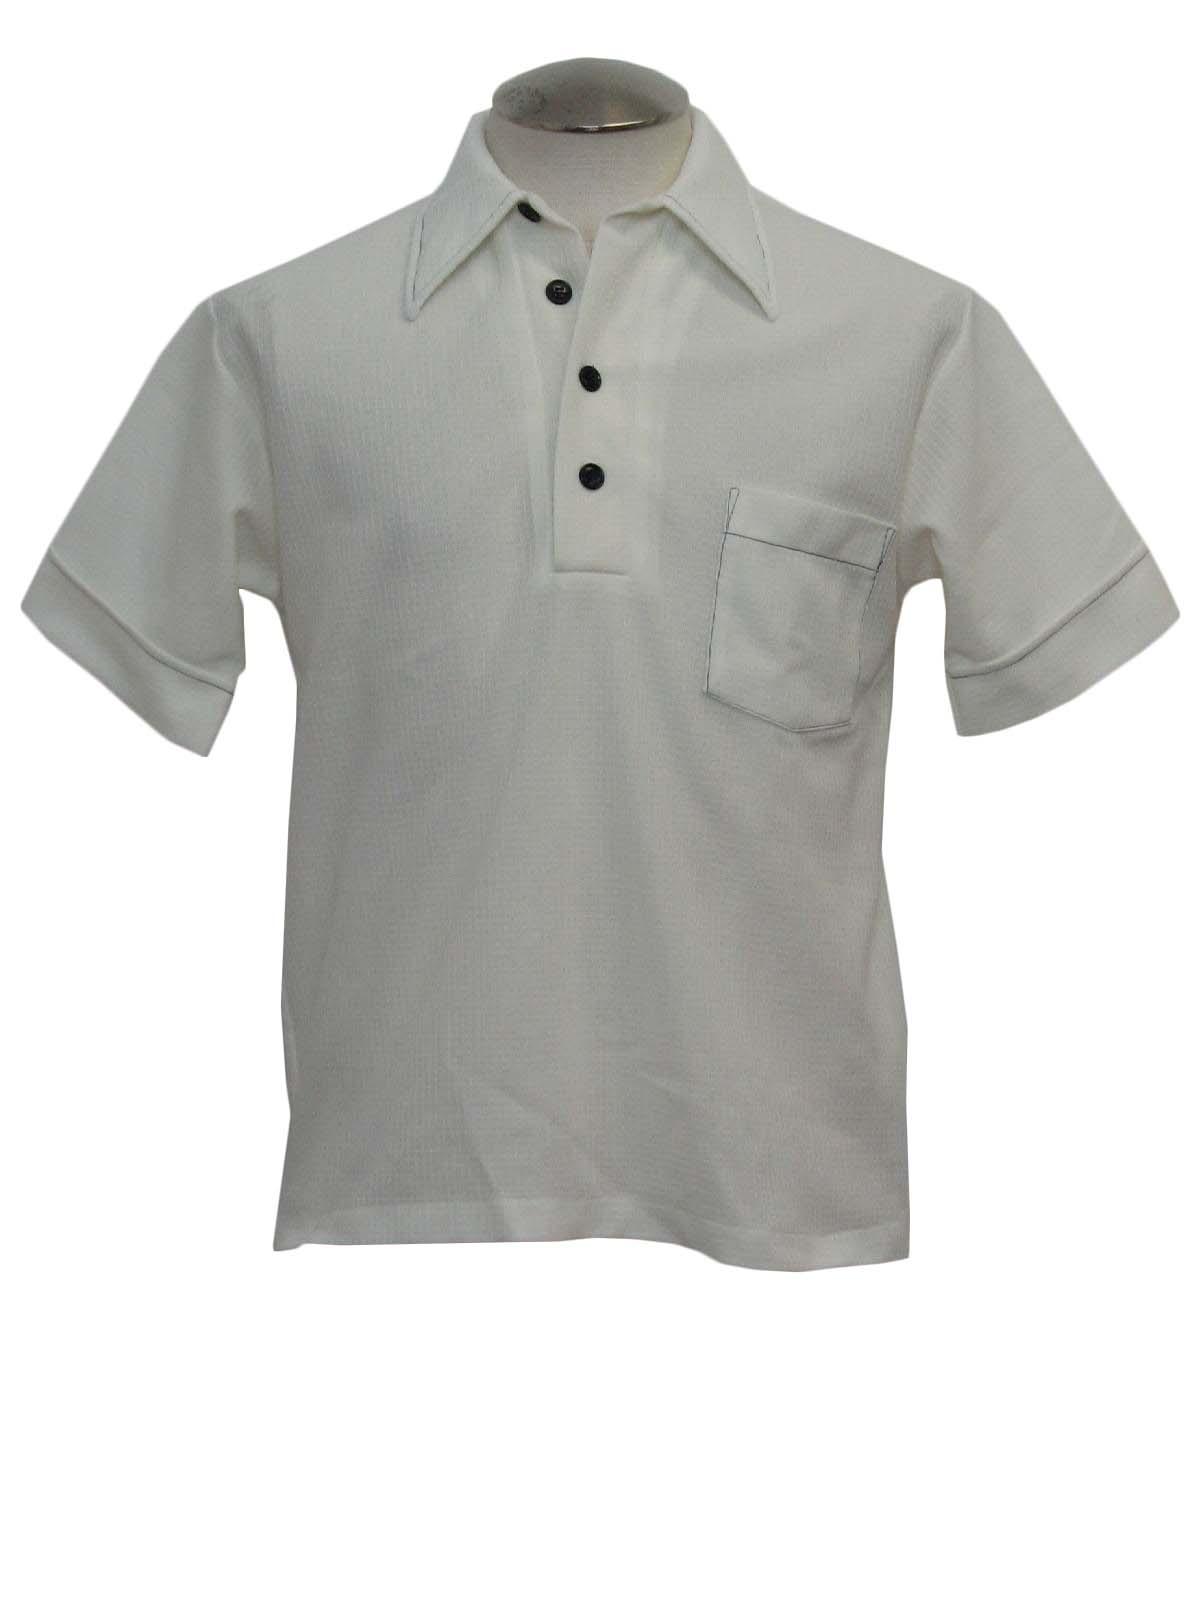 Seventies vintage shirt 70s jockey mens white light for Jockey full sleeve t shirts india